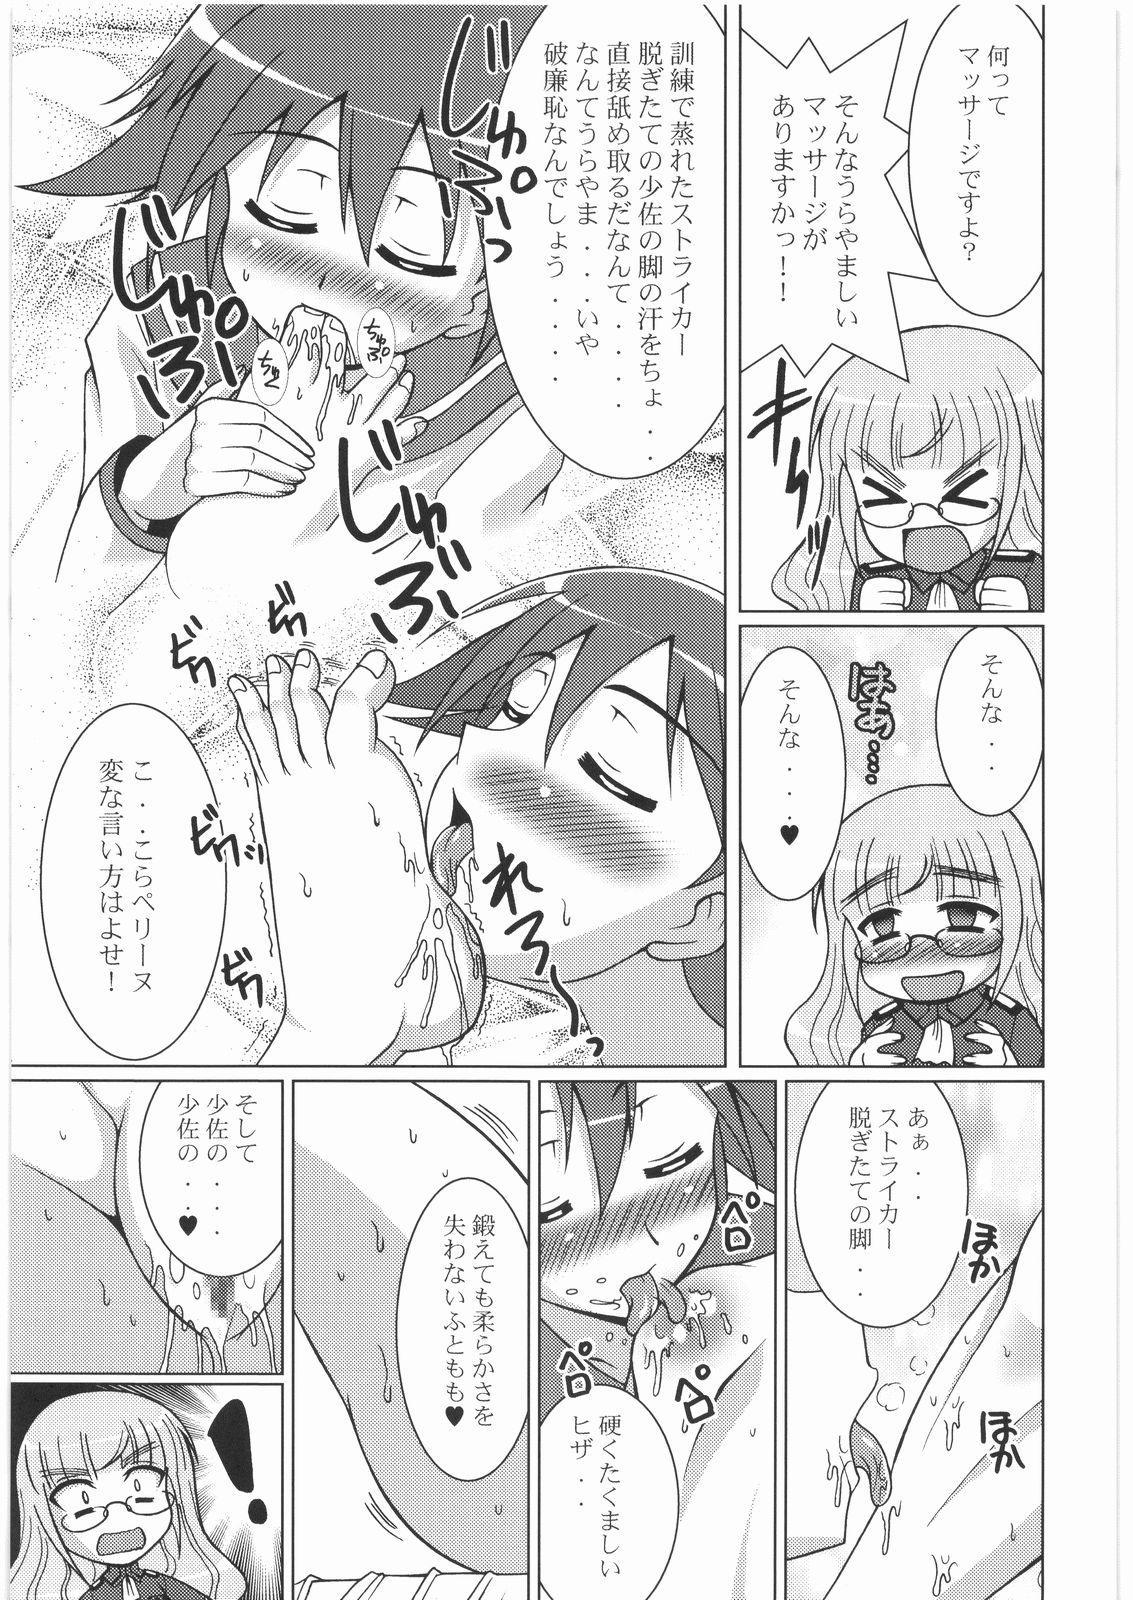 Strike Kyoukan 19